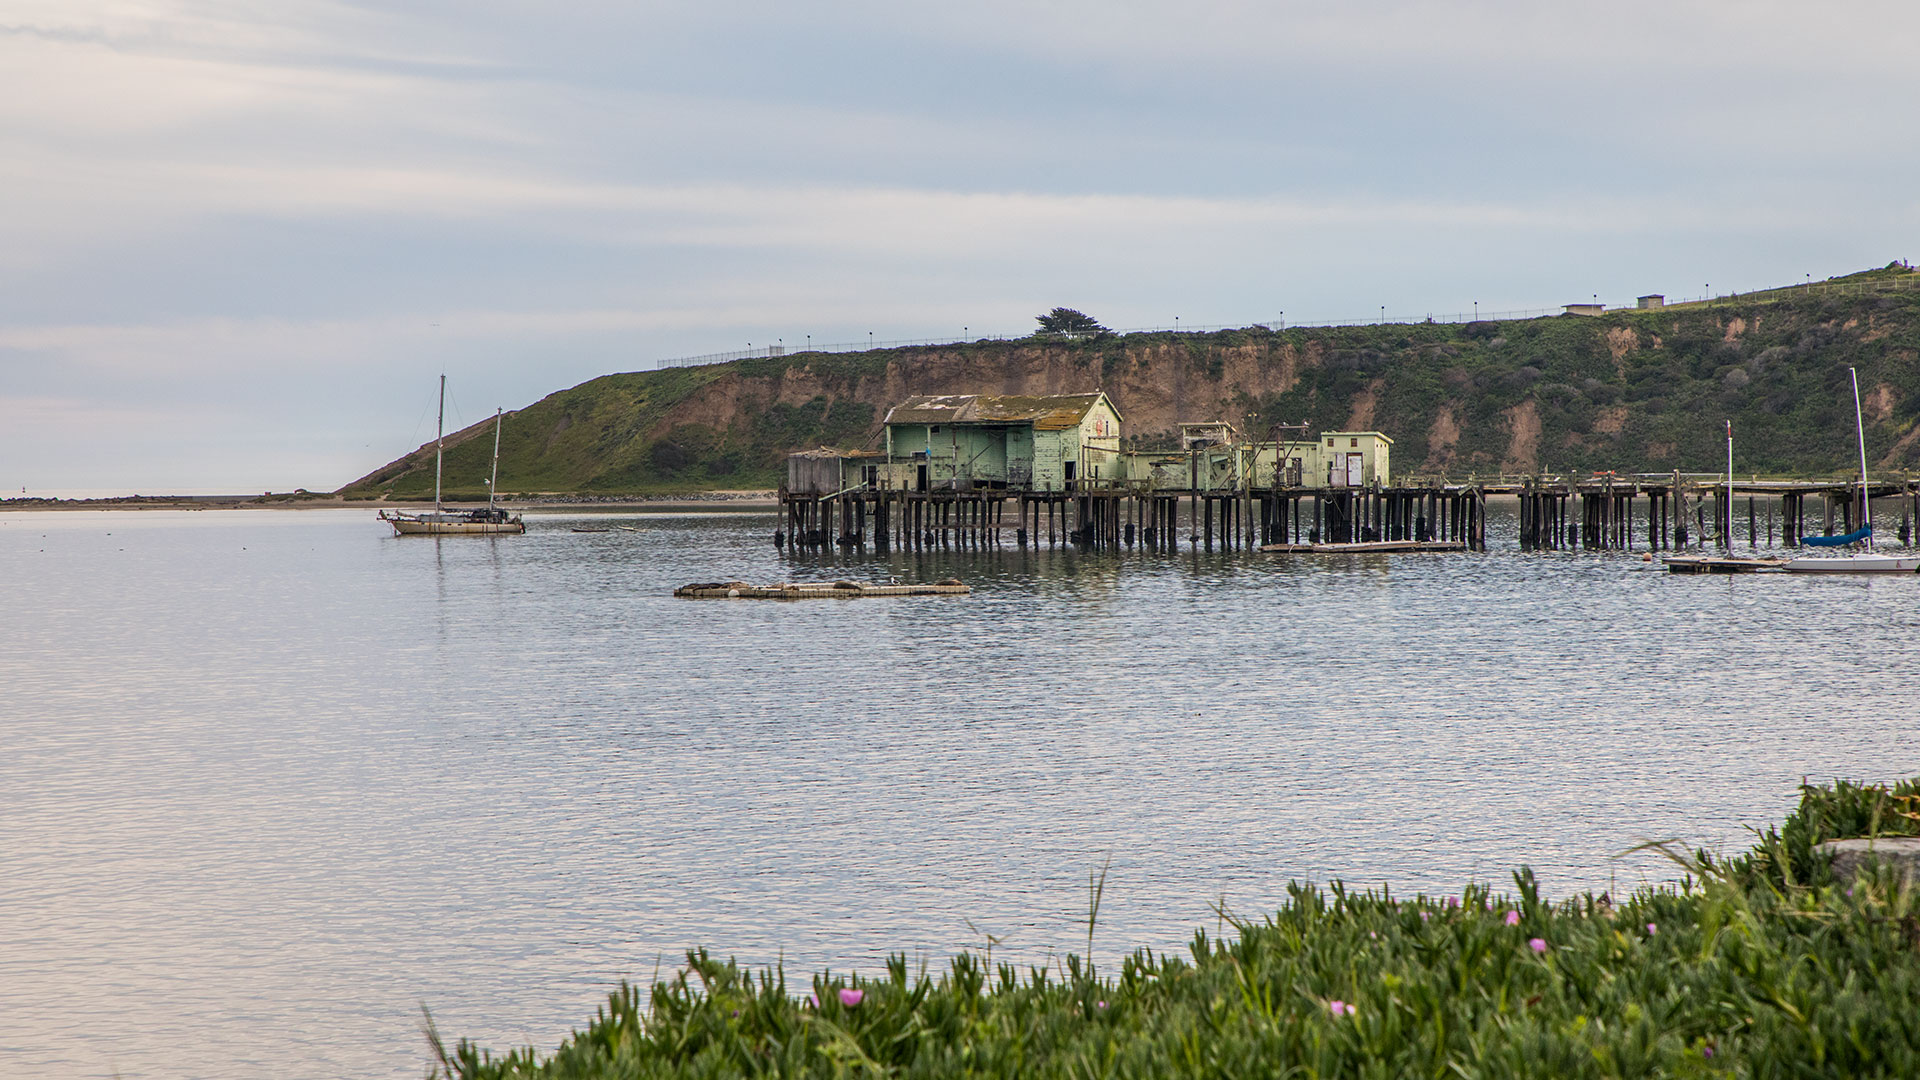 Romeo Pier - Pillar Point Harbor